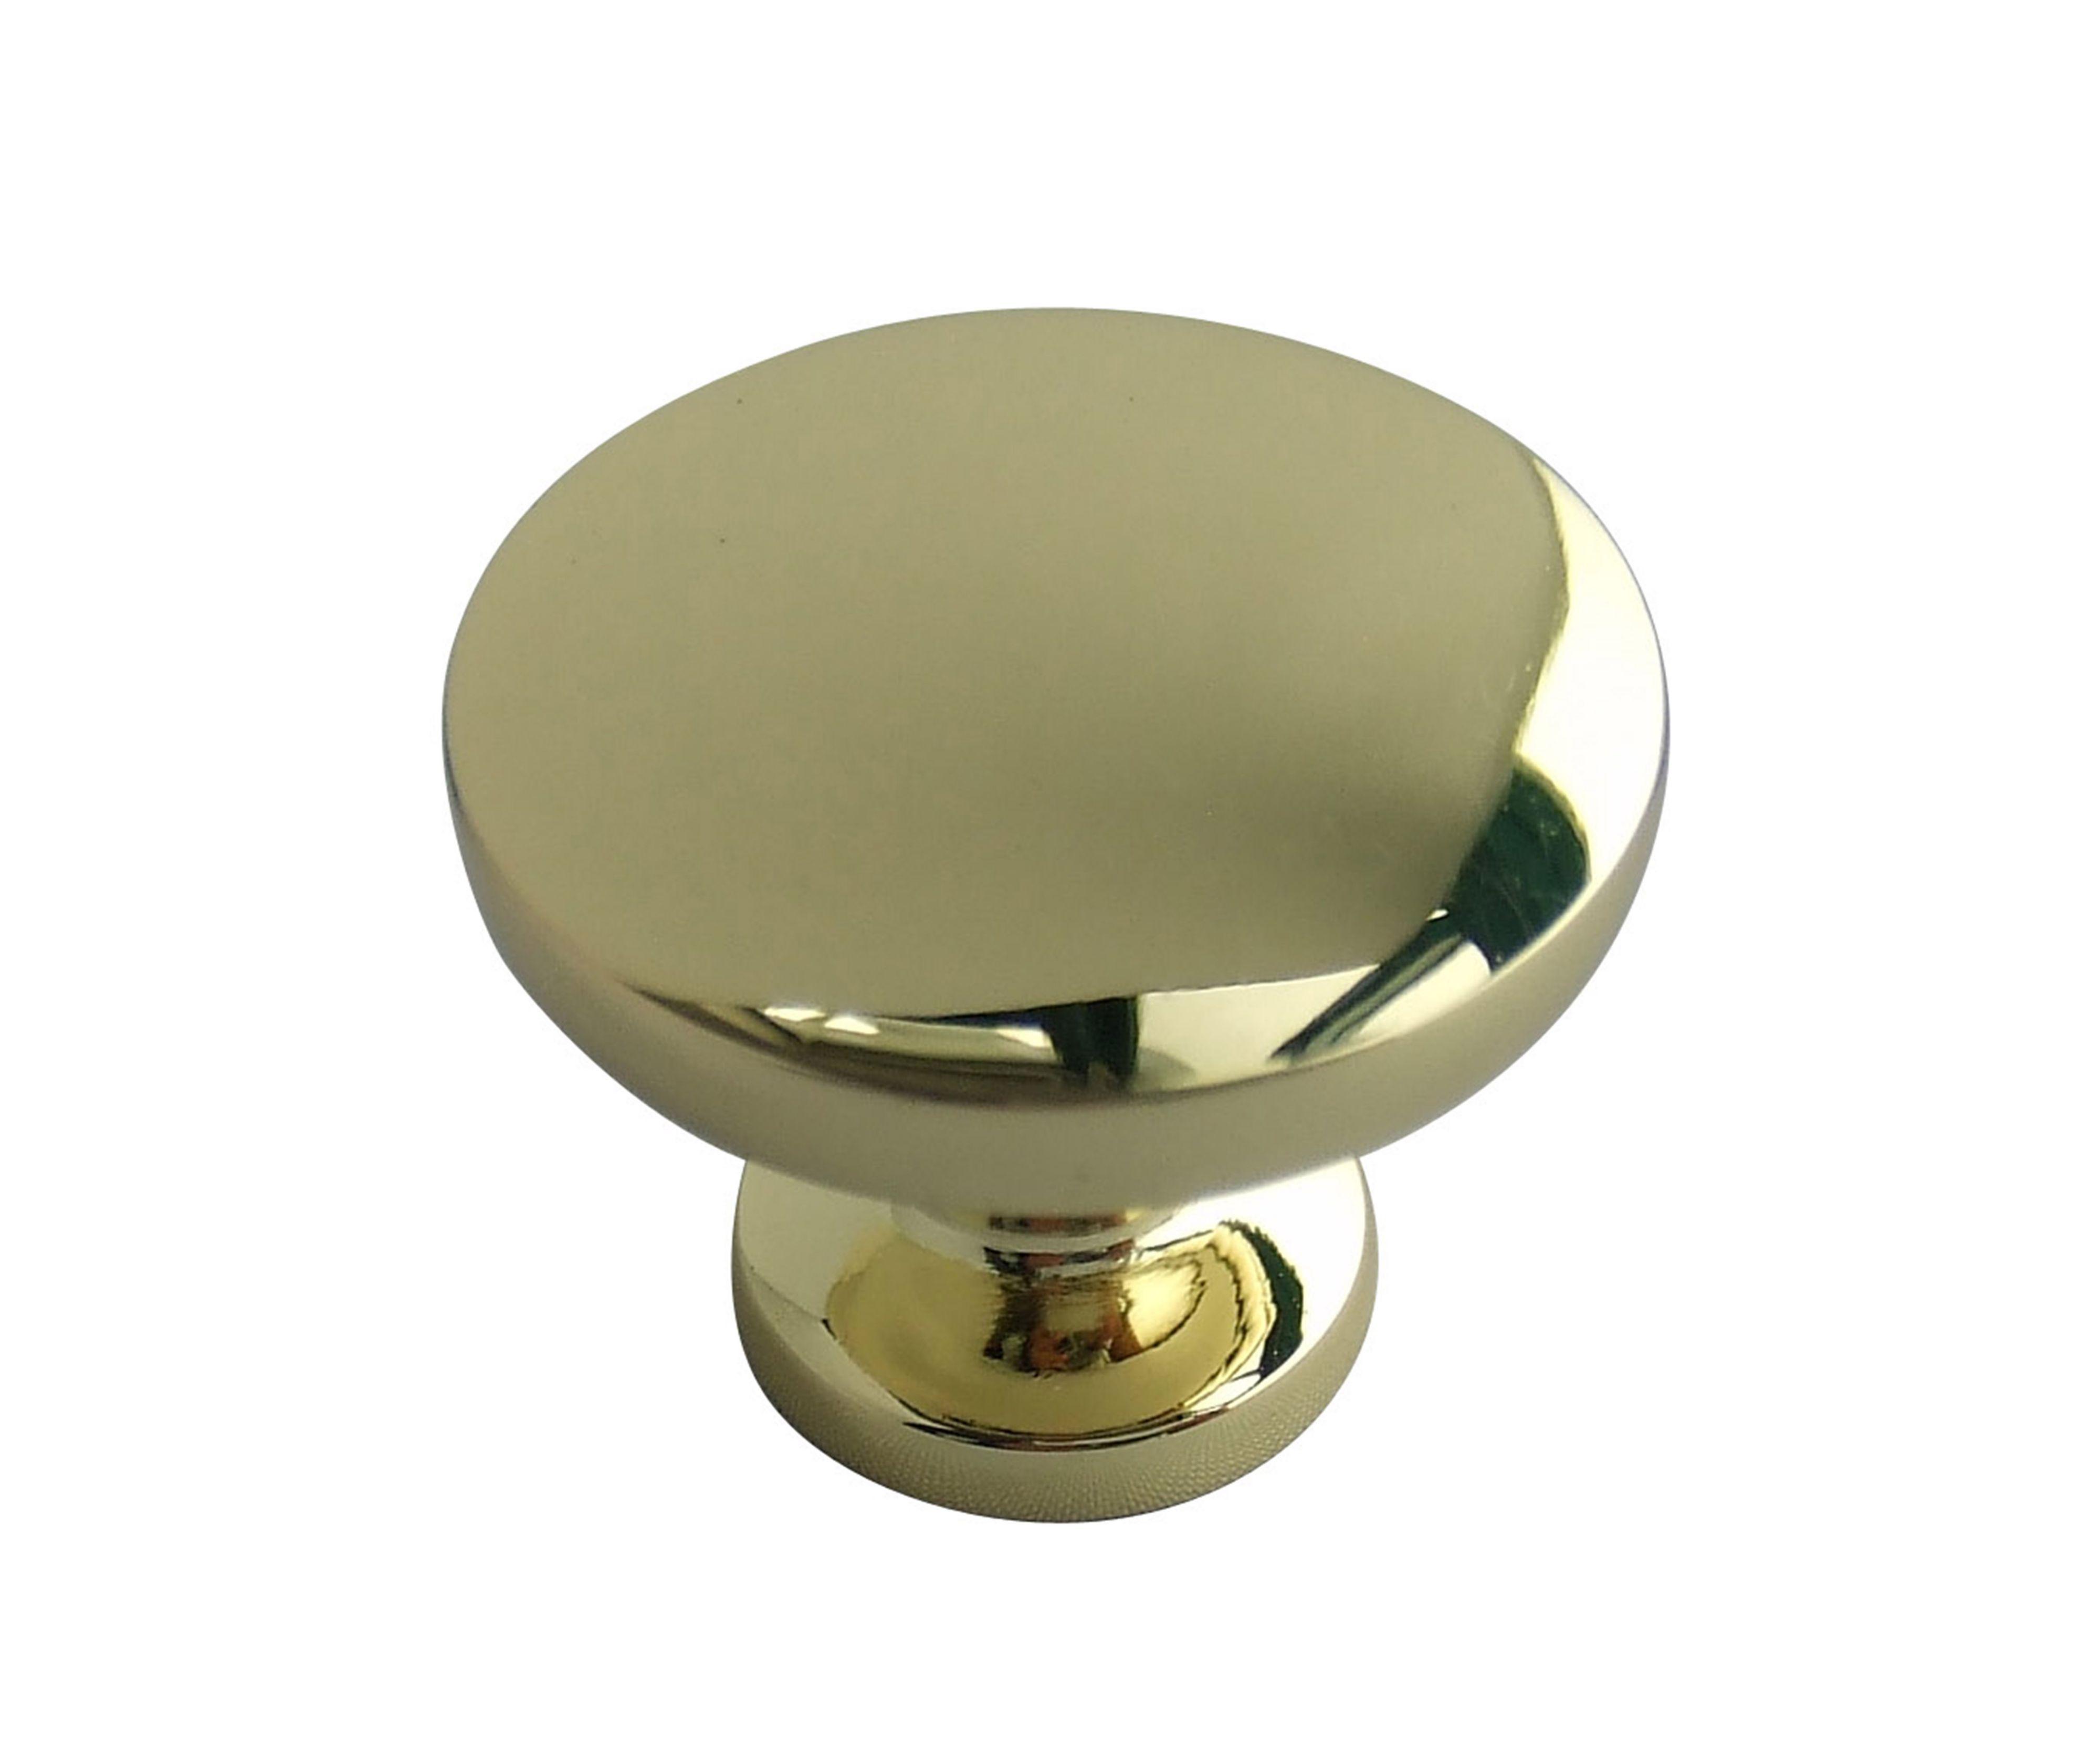 B&q Brass Effect Round Internal Knob Furniture Knob